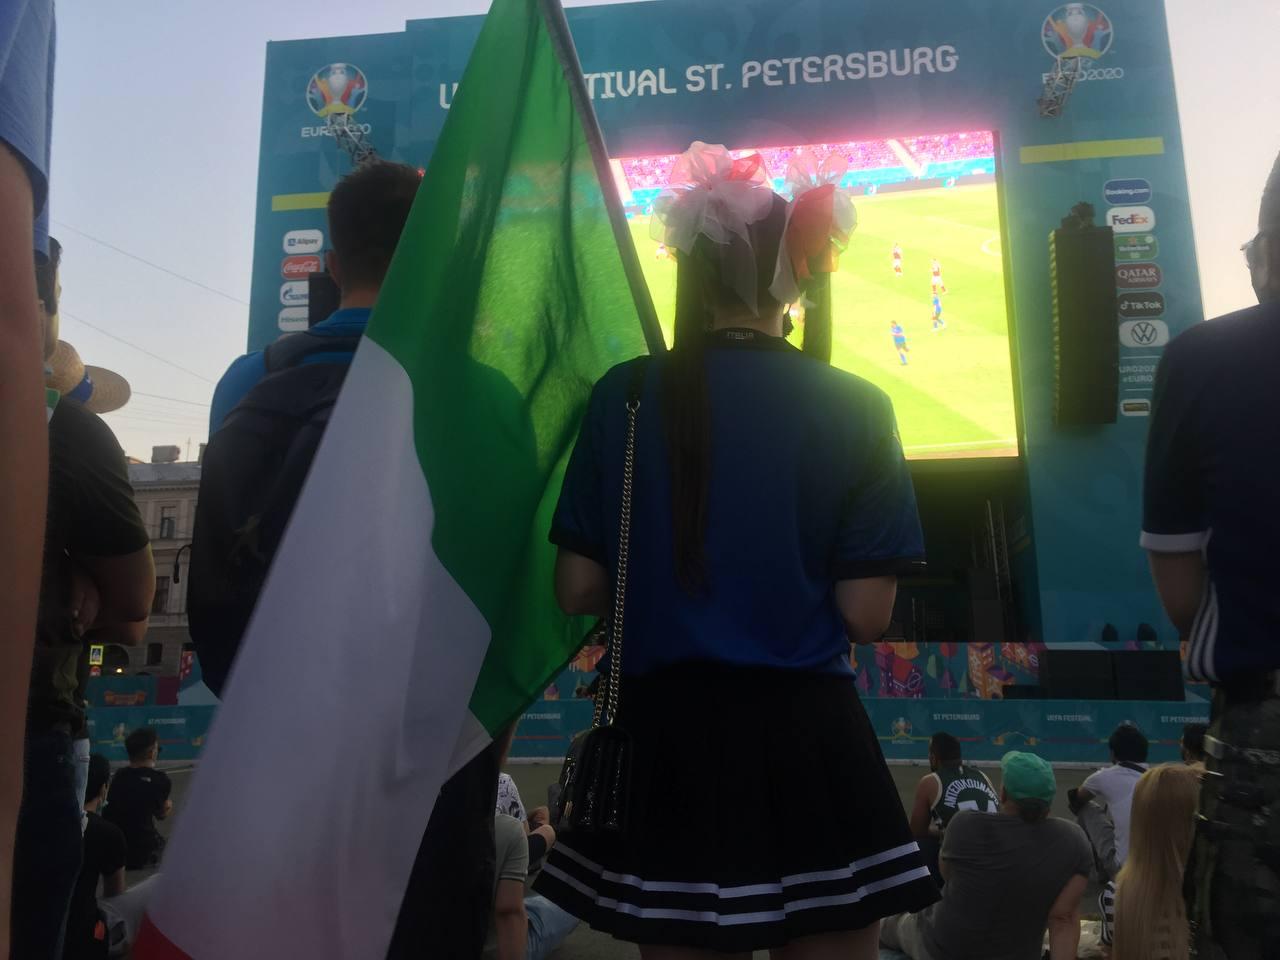 Евро-2020. Италия - Австрия. Четвертьфинал Евро 2020. Новости футбола.